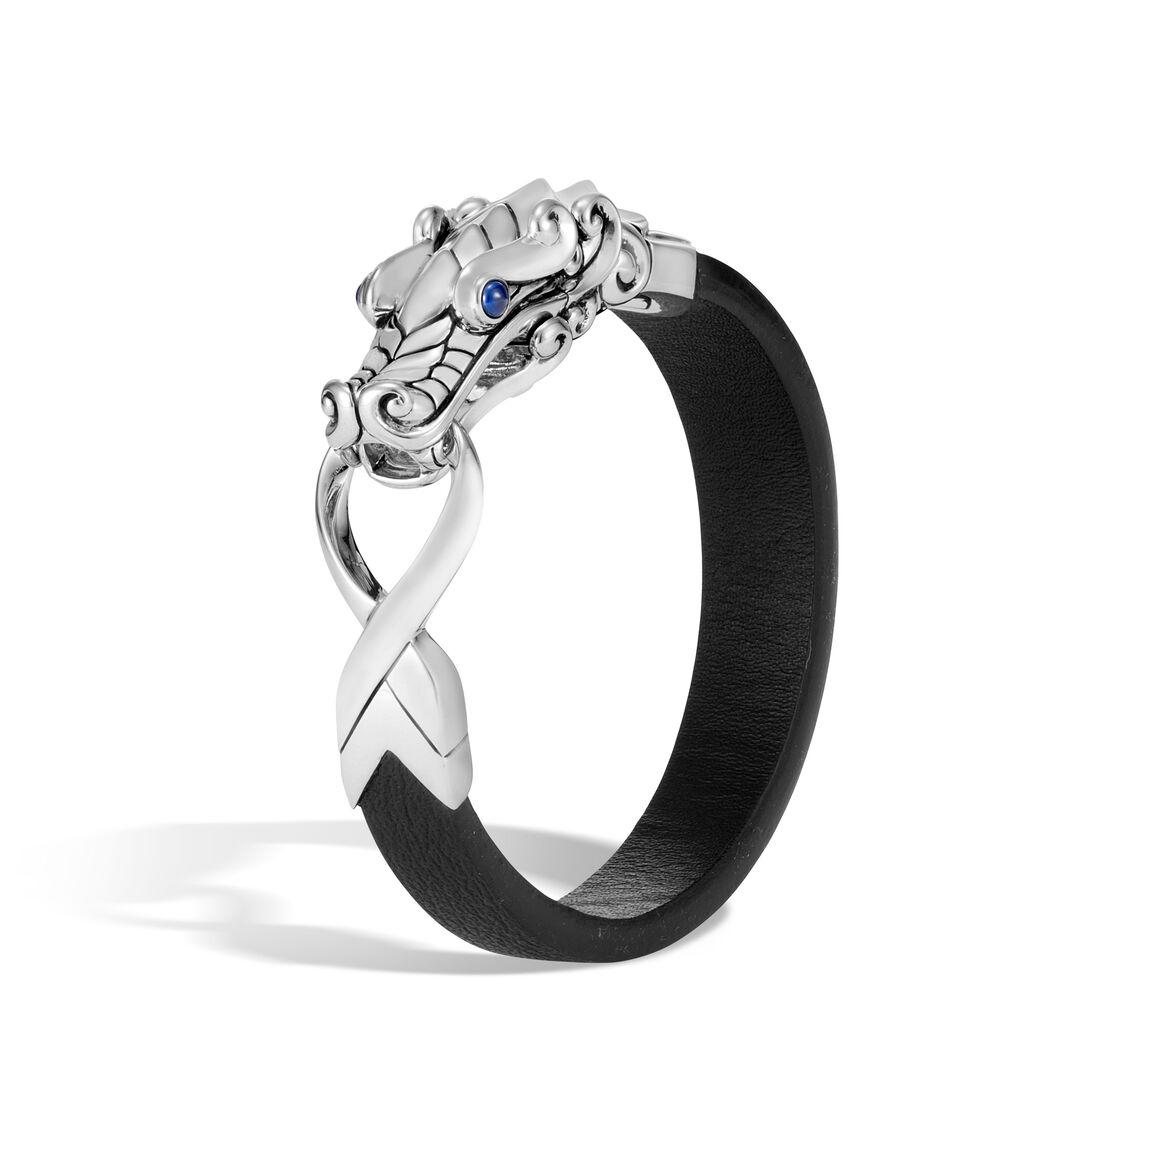 Legends Naga 15MM Bracelet in Silver and Leather